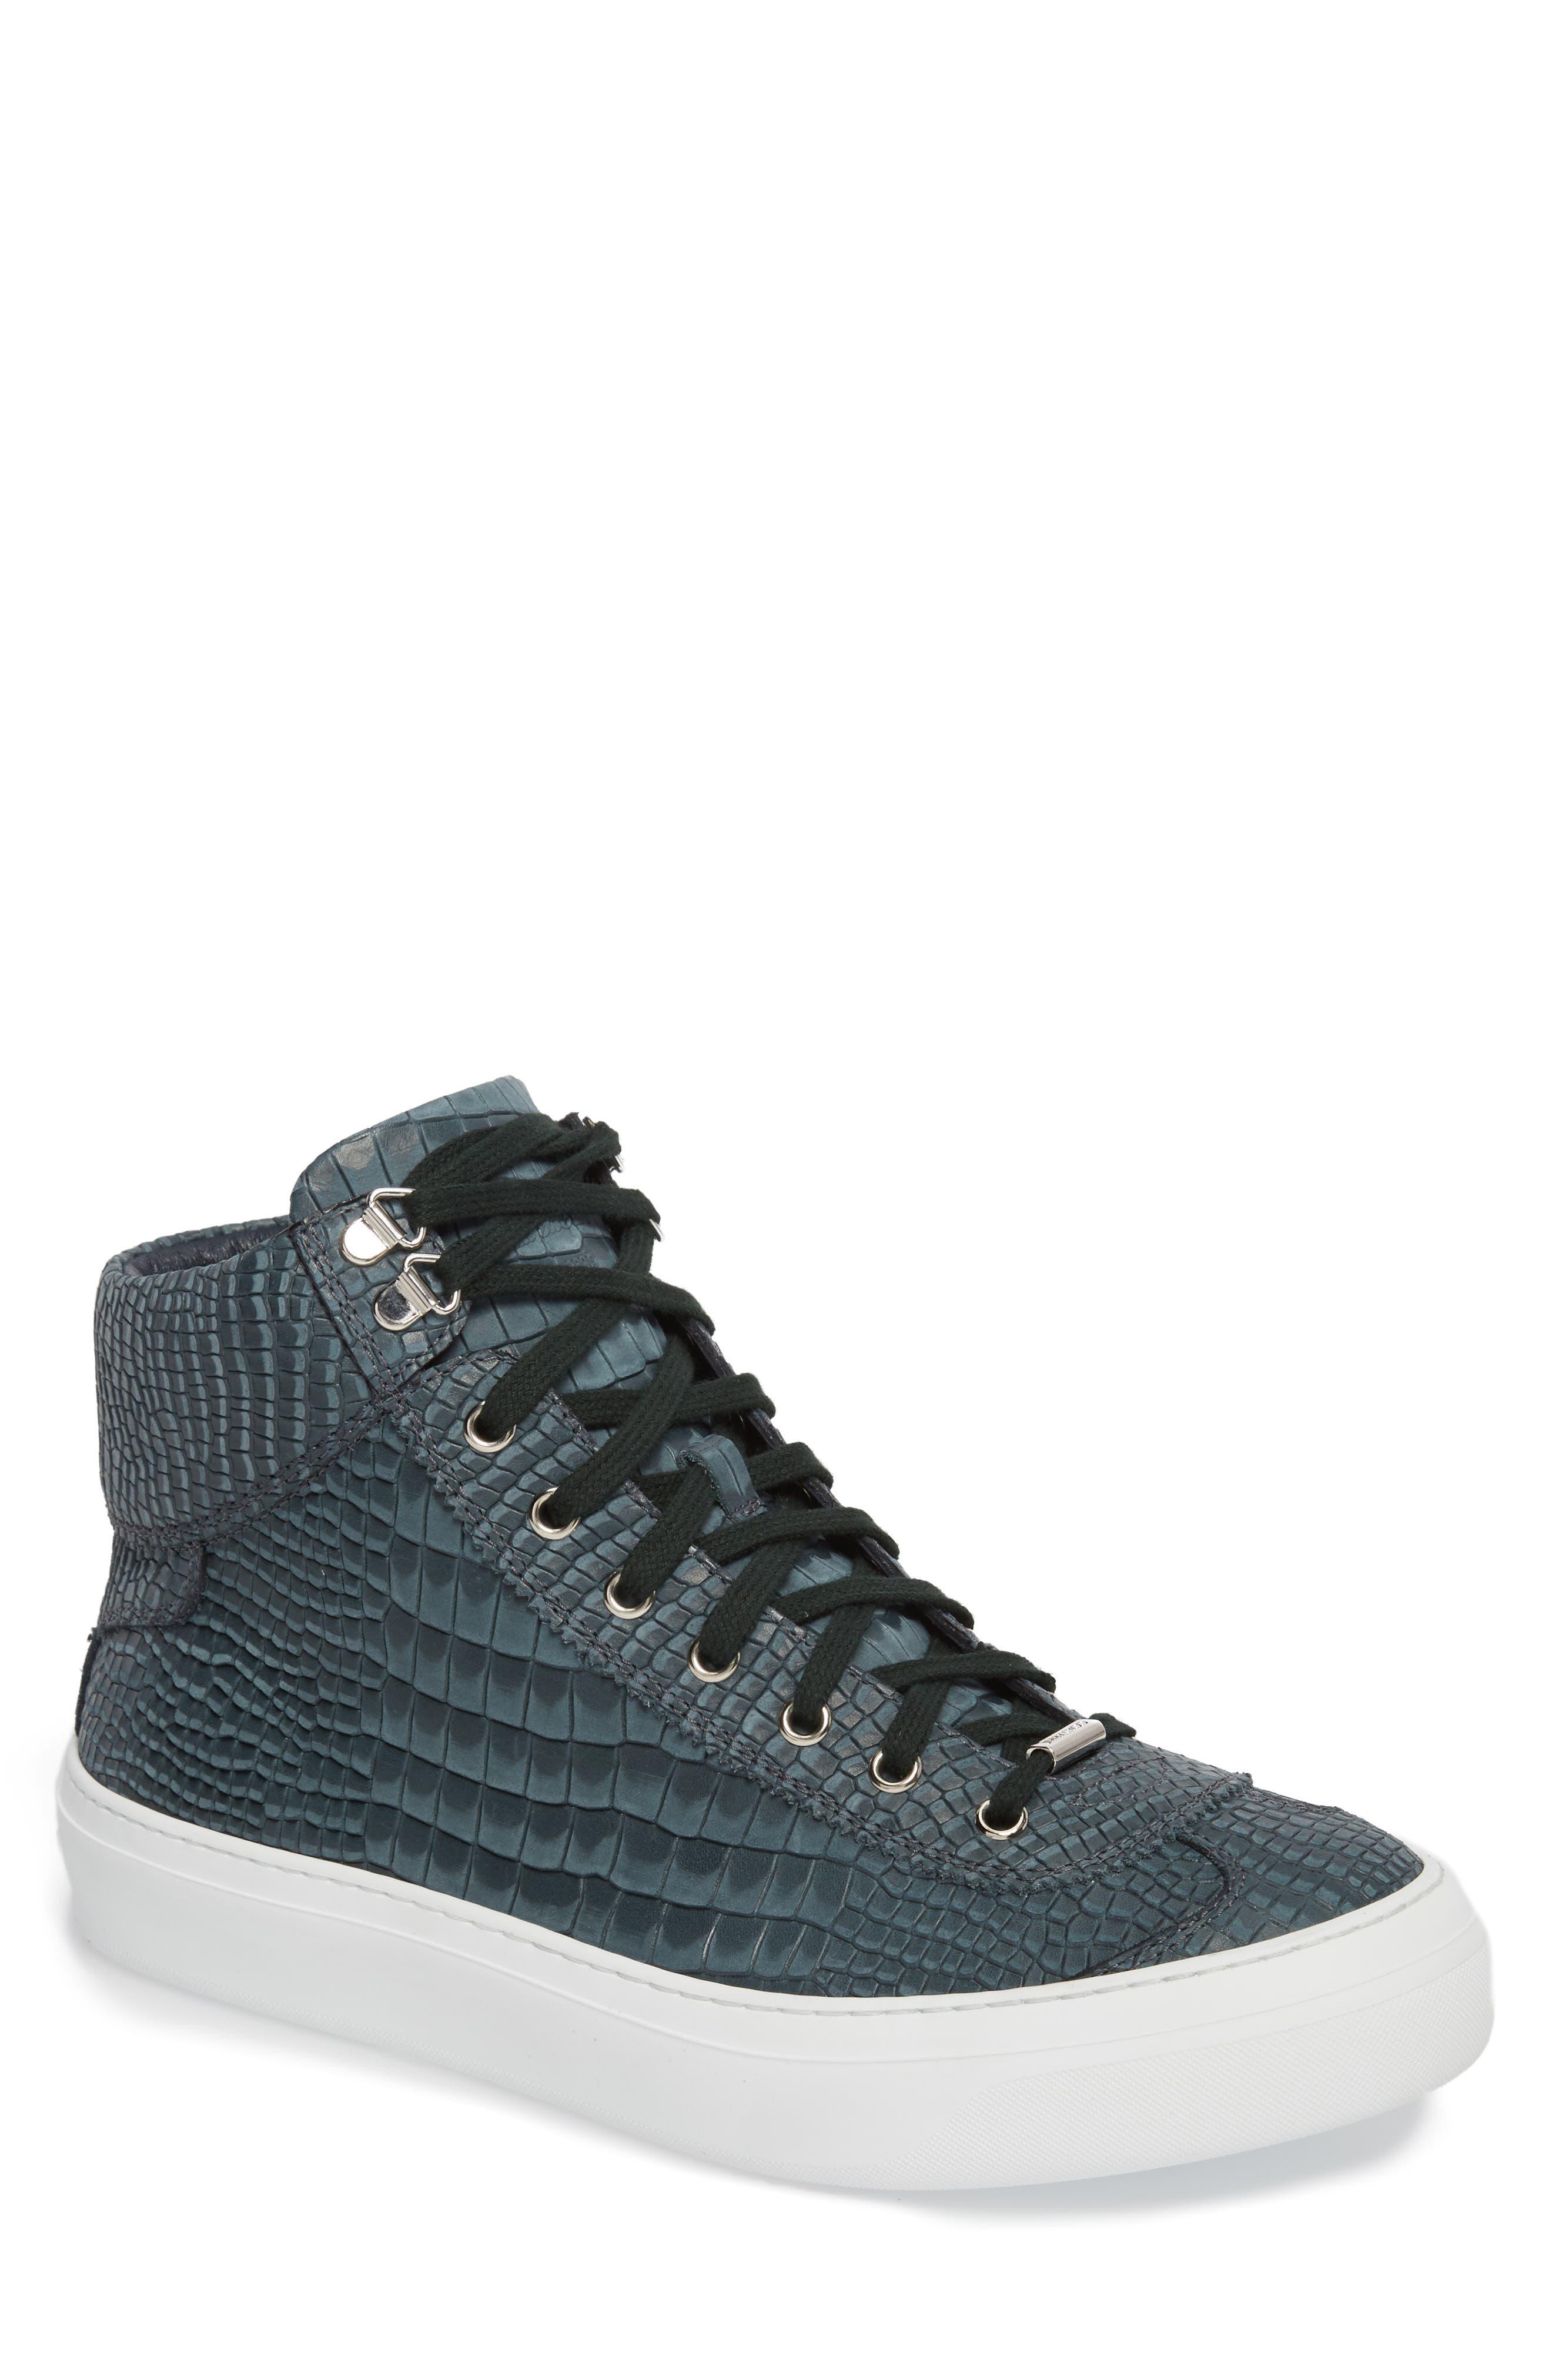 Argyle Sneaker,                             Main thumbnail 1, color,                             Dark Pavone Nubuck